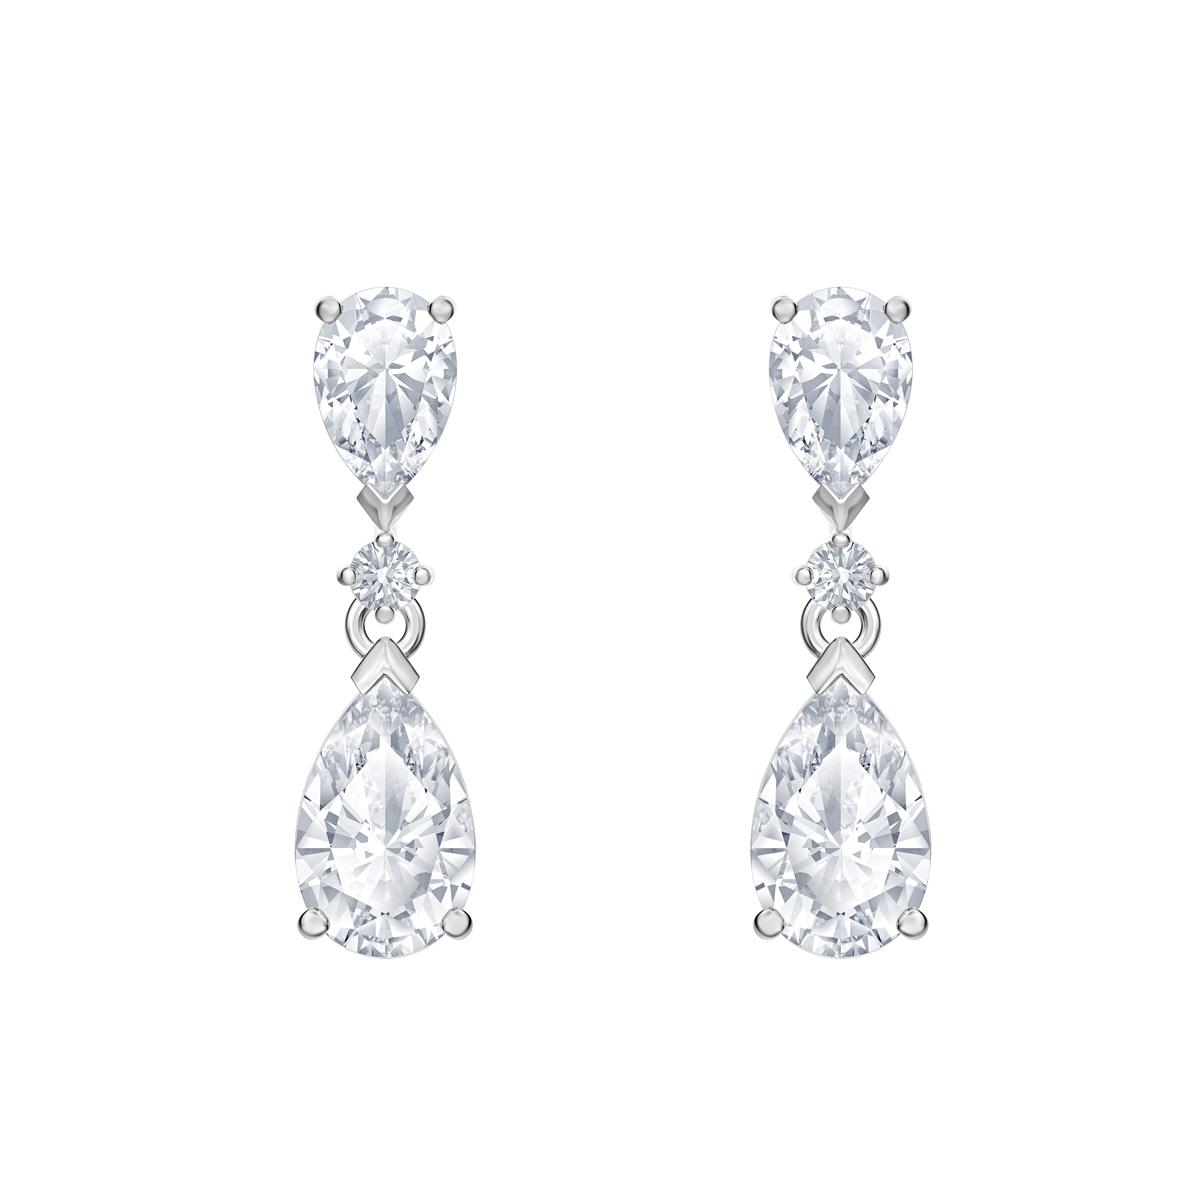 Swarovski Rhodium Silver and Crystal Palace Drop Pierced Earrings